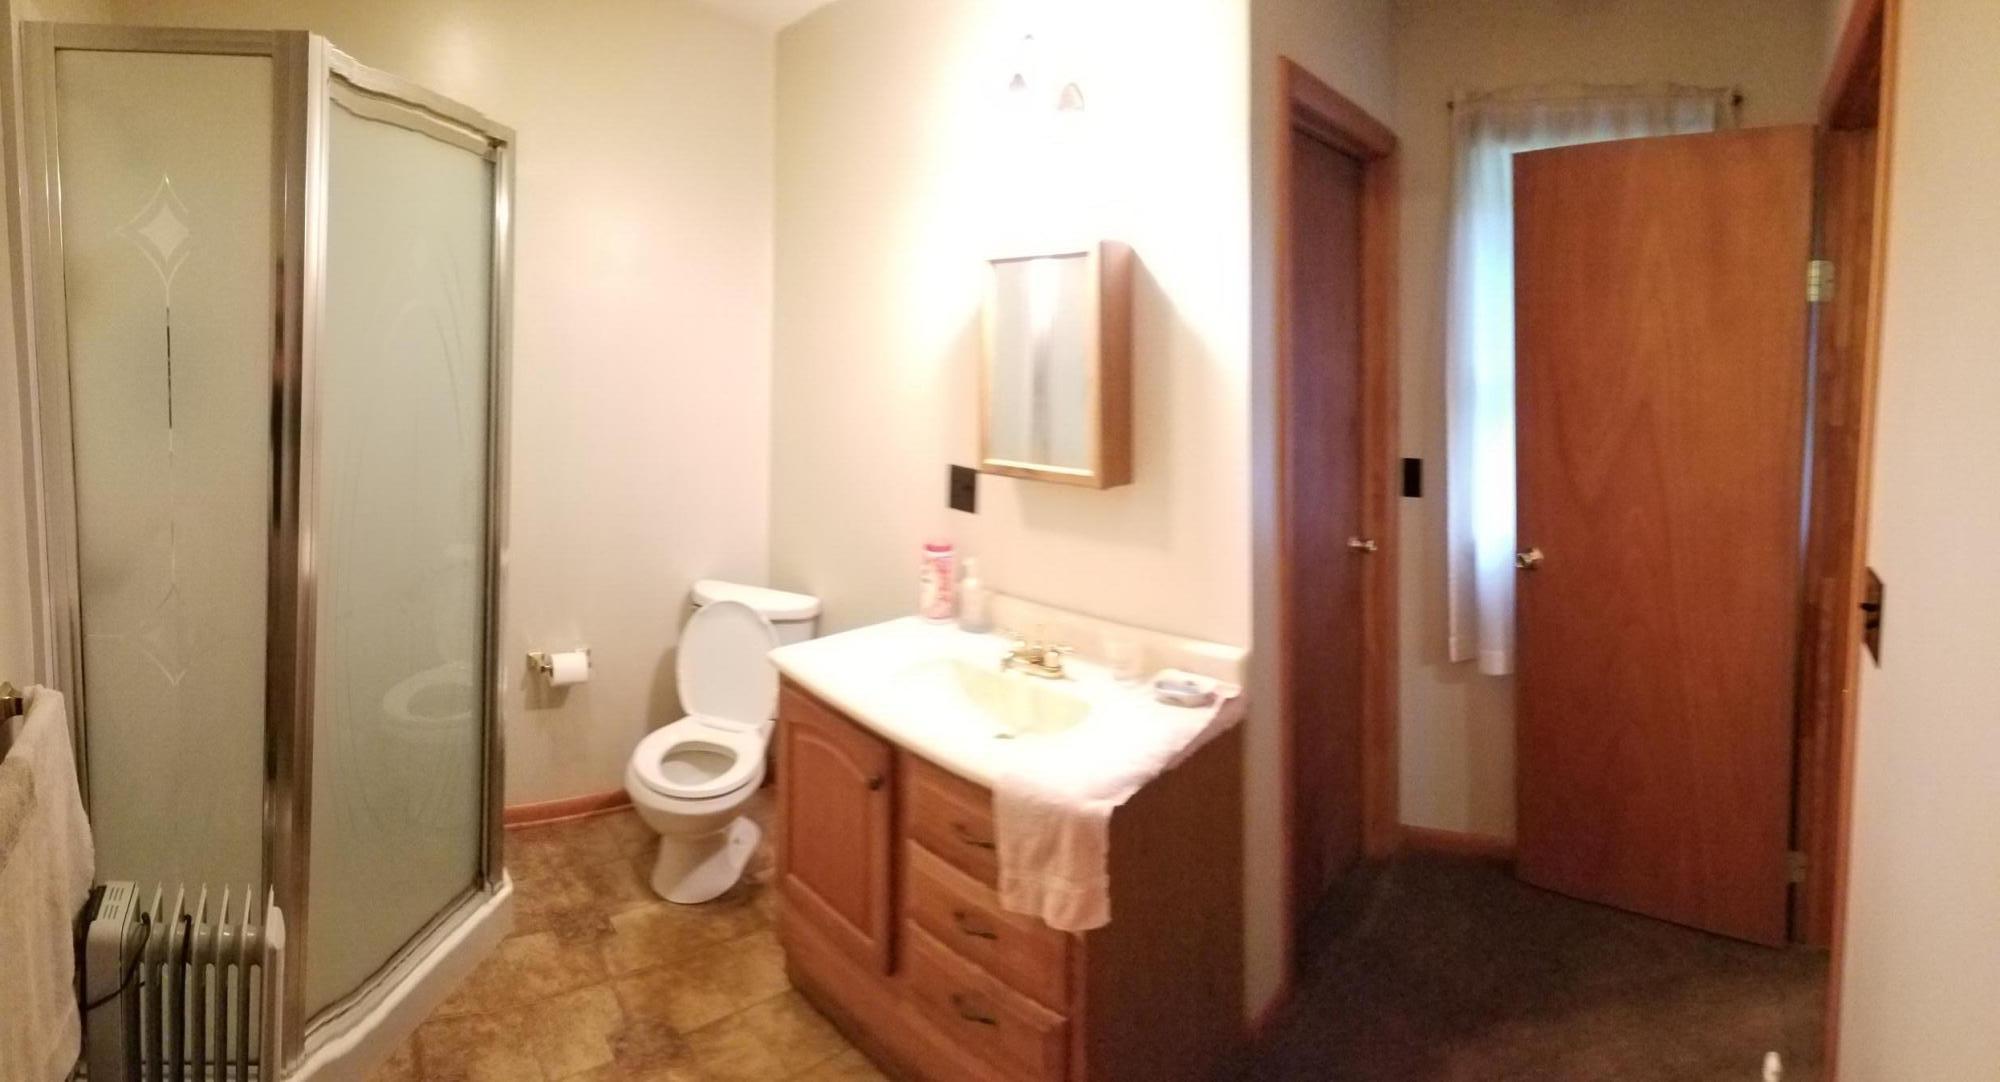 347 HARRIS LANE, Montoursville, PA 17754, 3 Bedrooms Bedrooms, ,2 BathroomsBathrooms,Residential,For sale,HARRIS,WB-92495